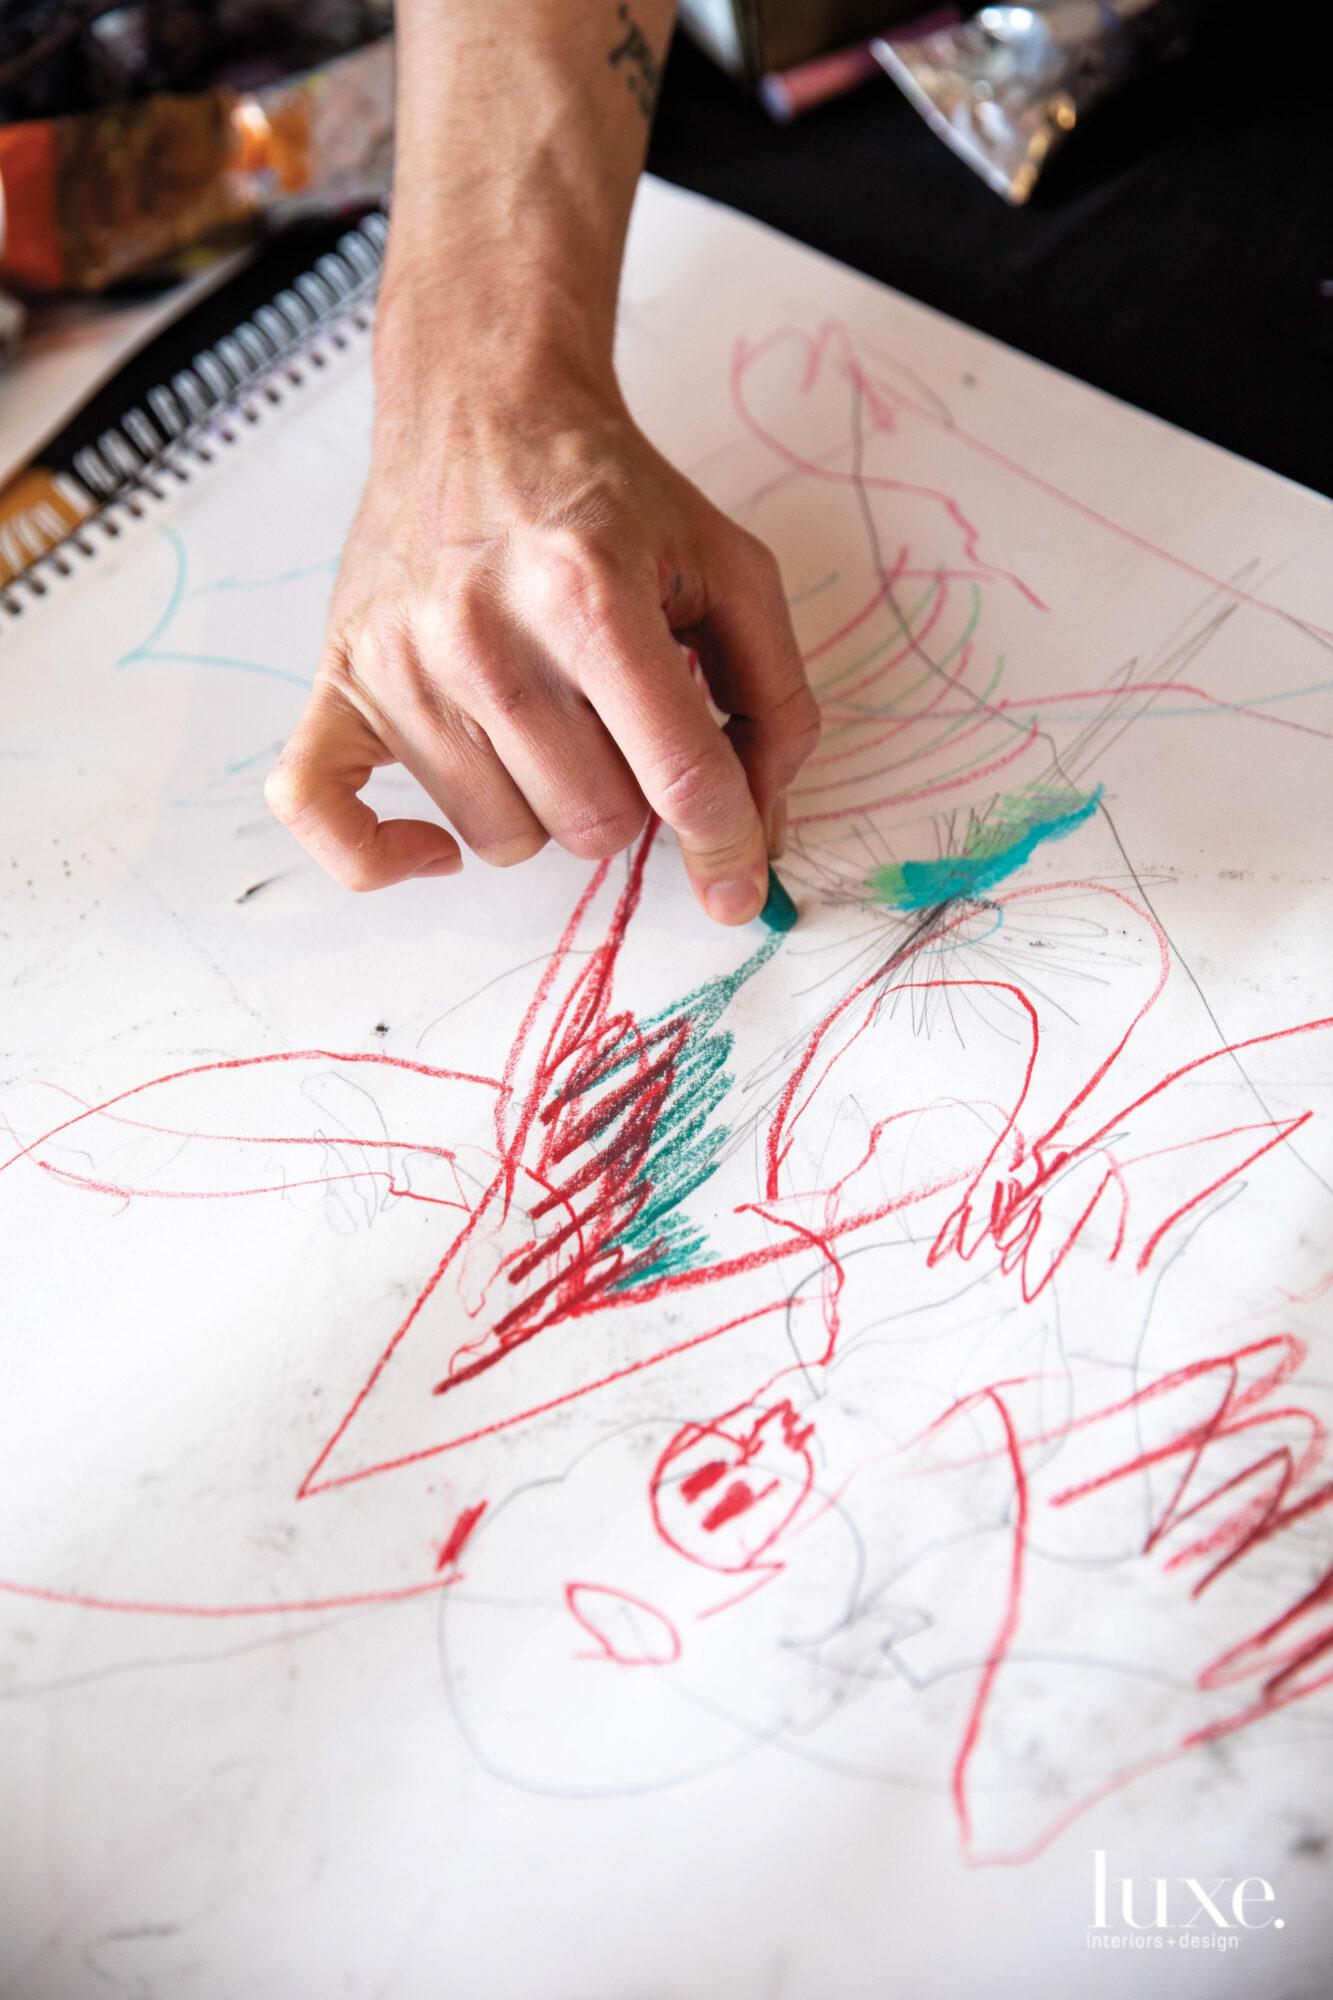 Damian drawing